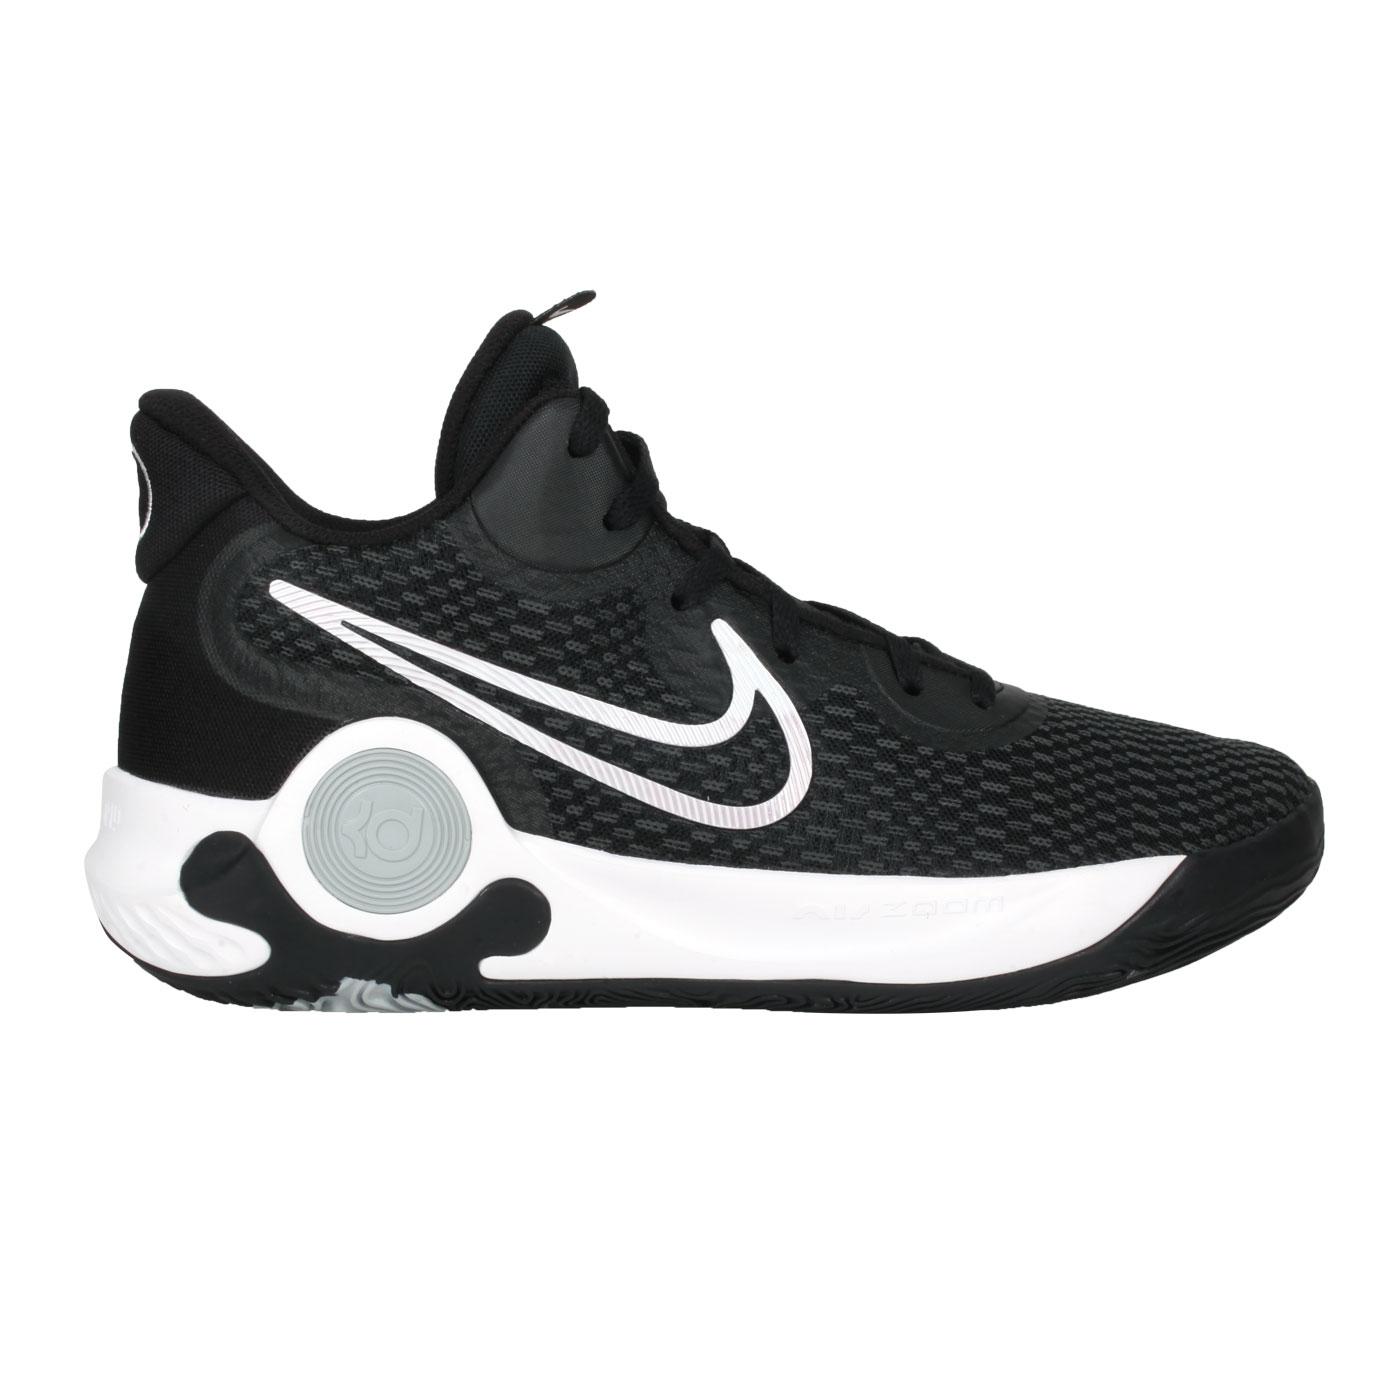 NIKE 男款籃球鞋  @KD TREY 5 IX EP@CW3402002 - 黑白